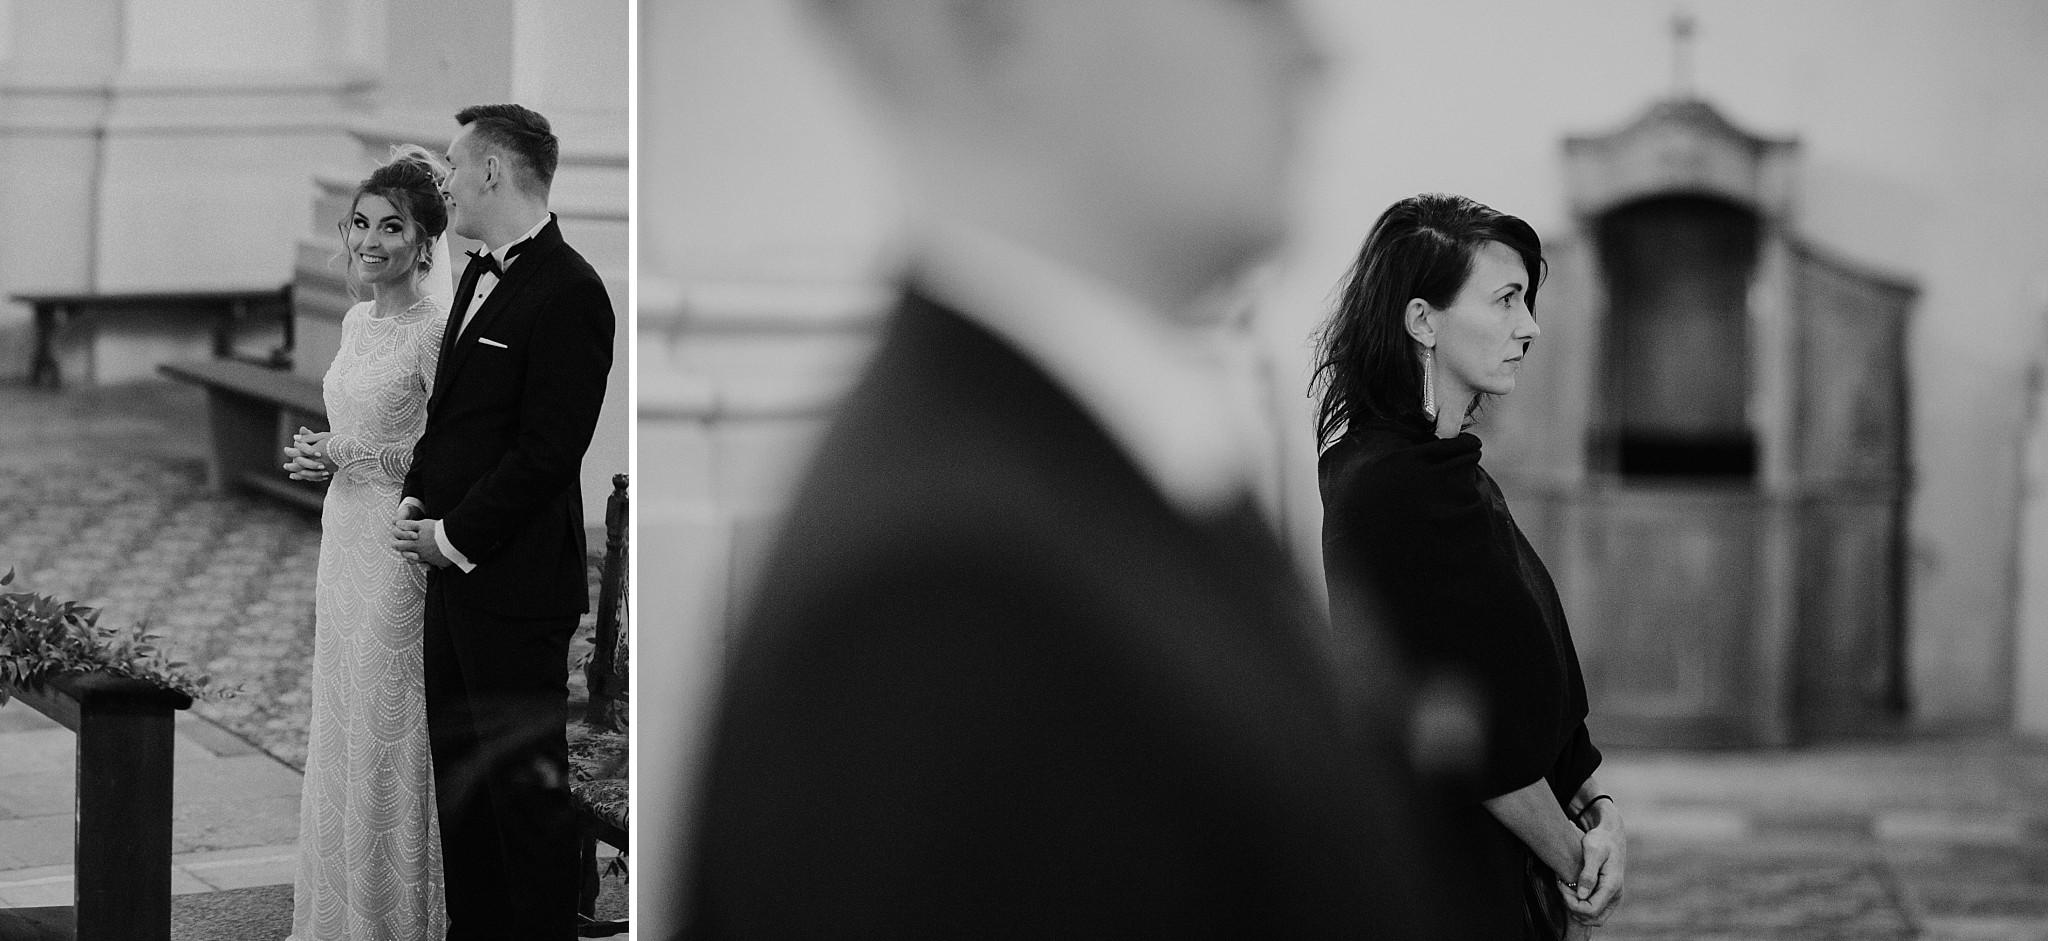 fotograf poznan wesele dobra truskawka piekne wesele pod poznaniem wesele w dobrej truskawce piekna para mloda slub marzen slub koronawirus slub listopad wesele koronawirus 162